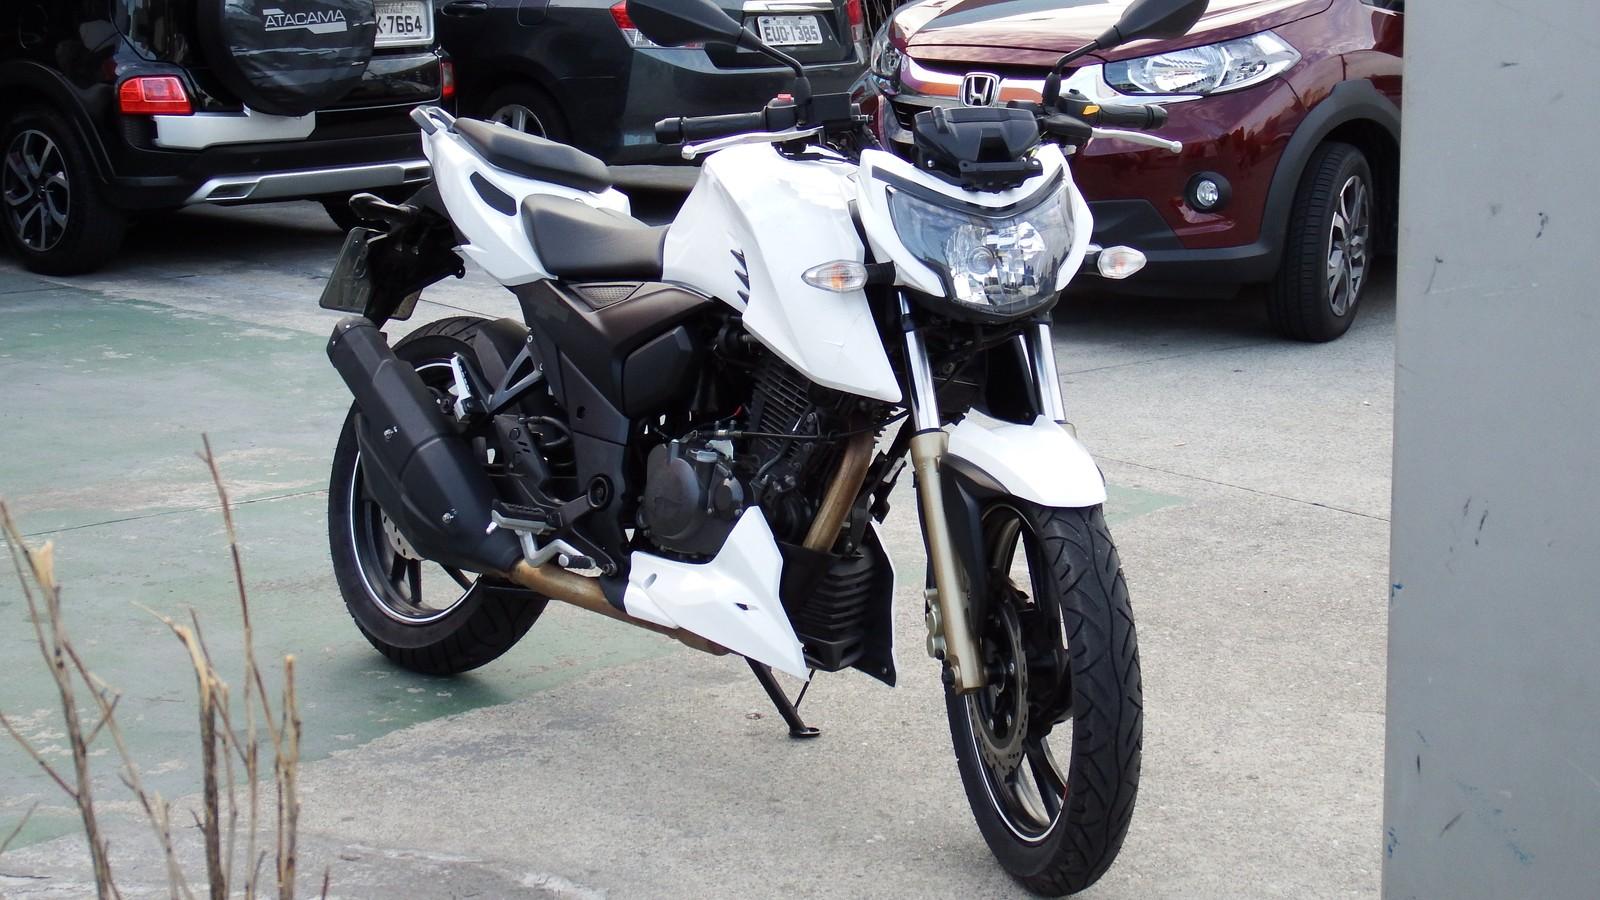 Nova Apache Rtr 200 1 Motorede